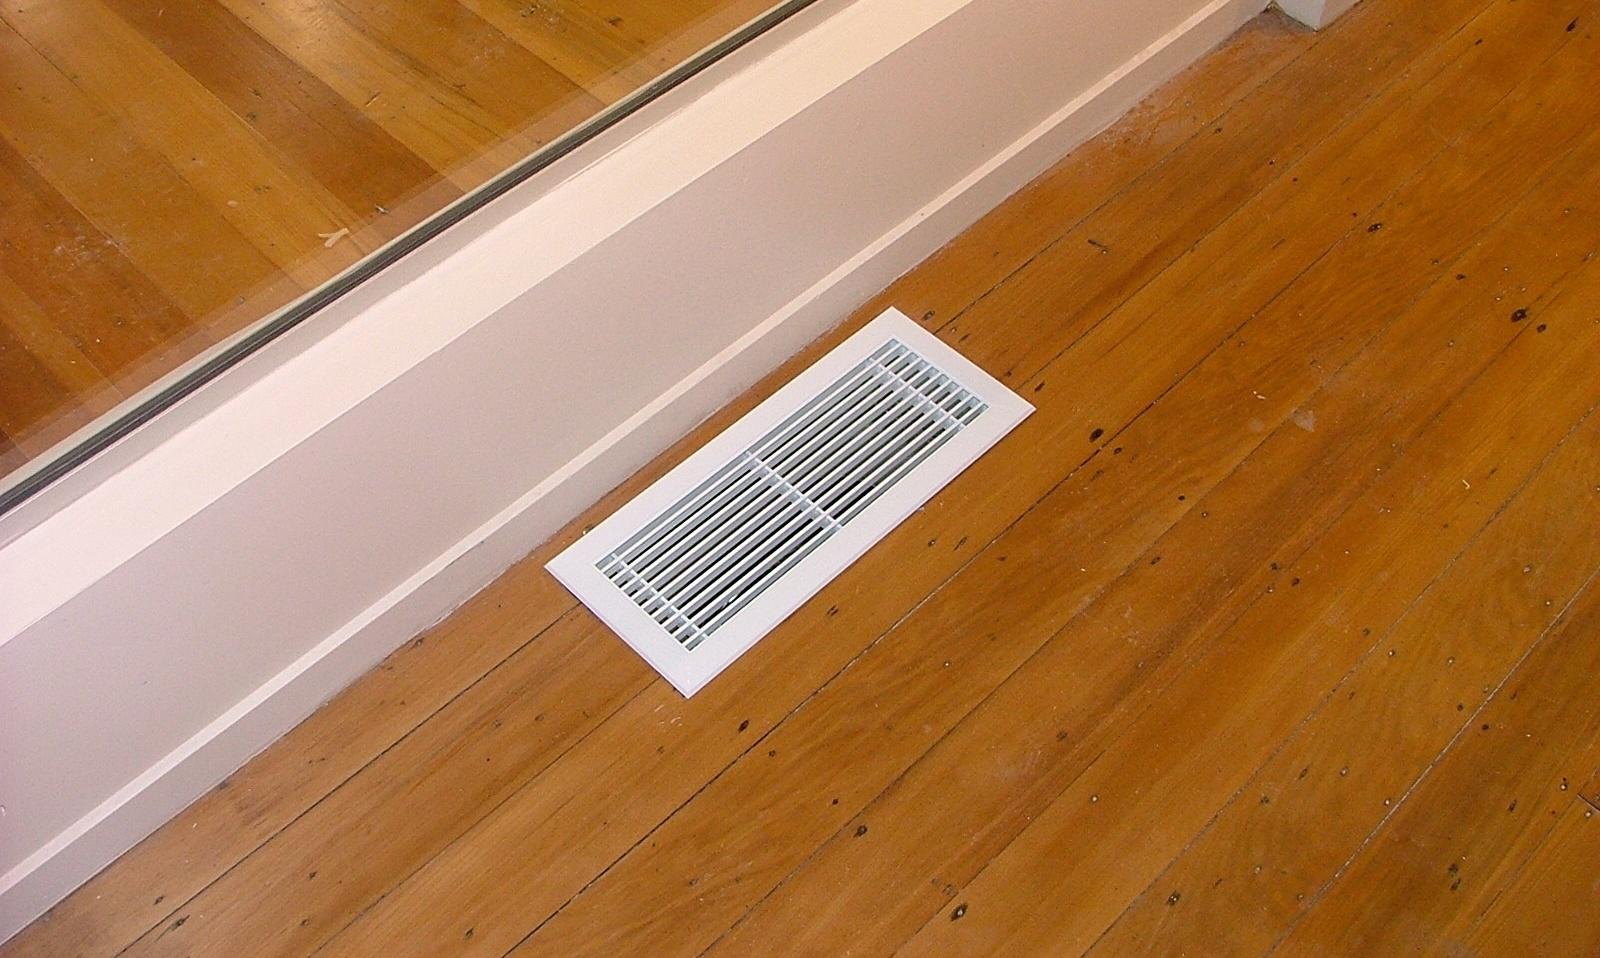 stockvault-air-vent-in-wooden-floor113826-397496-edited.jpg